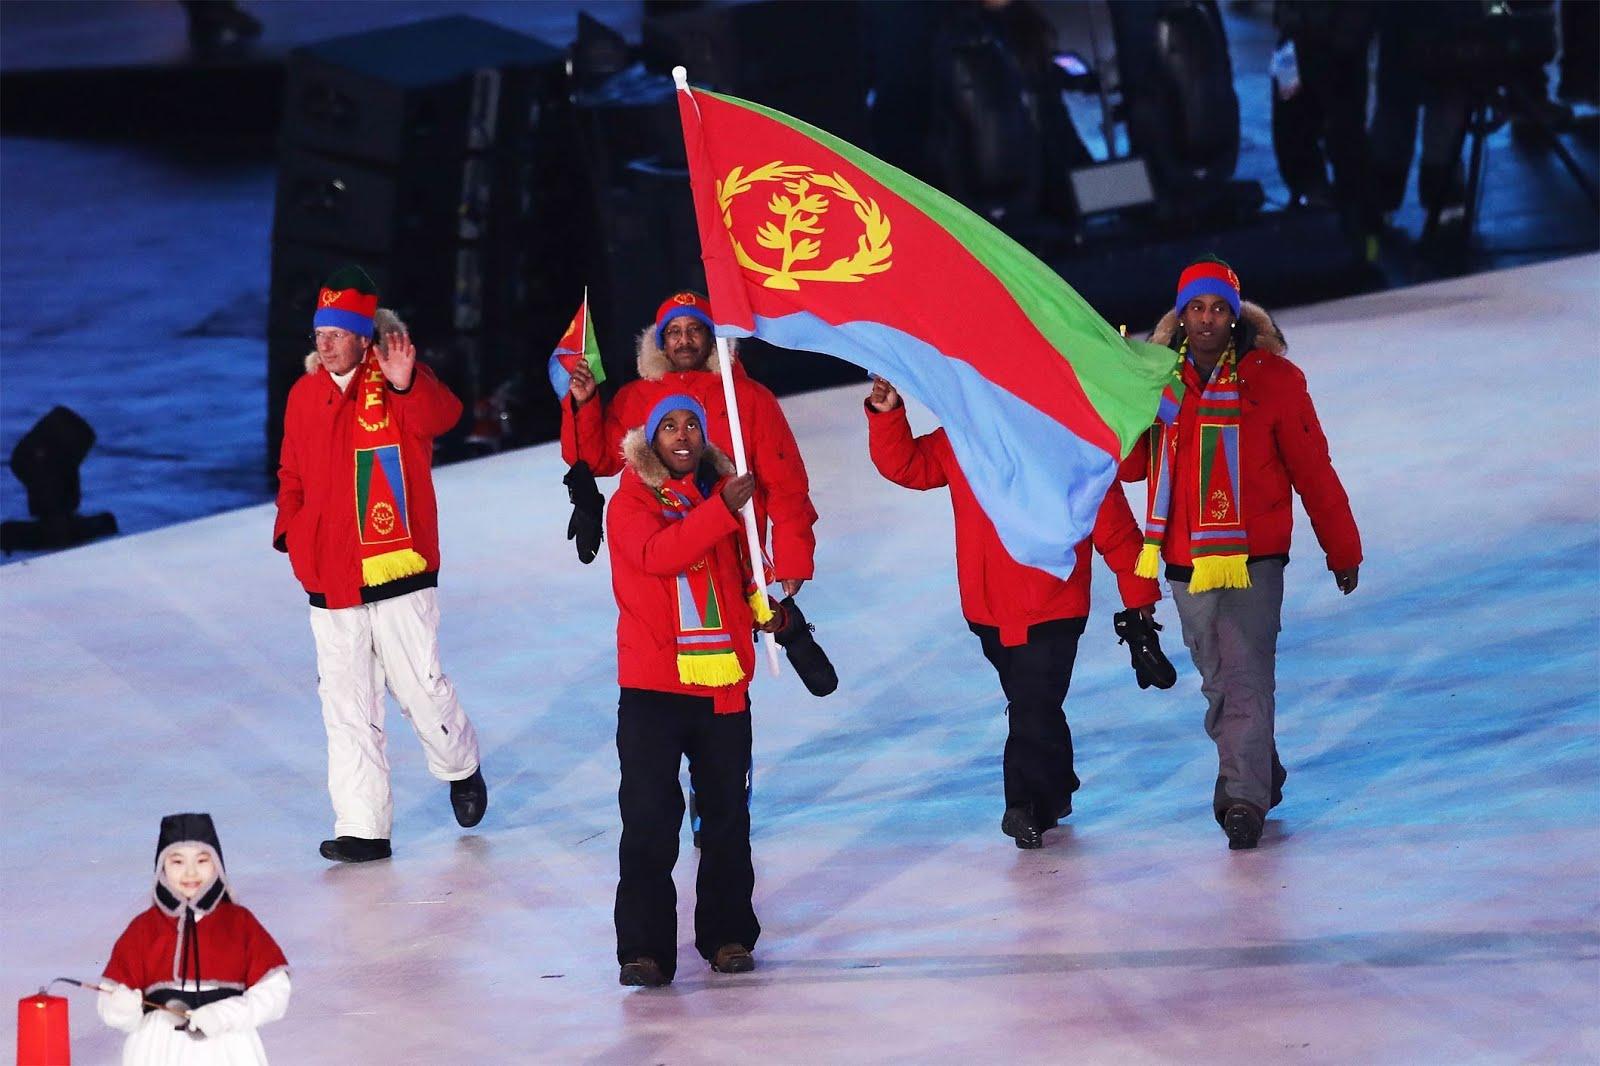 <Shannon-Ogbani Abeda: An Olympic Landmark For Eritrea